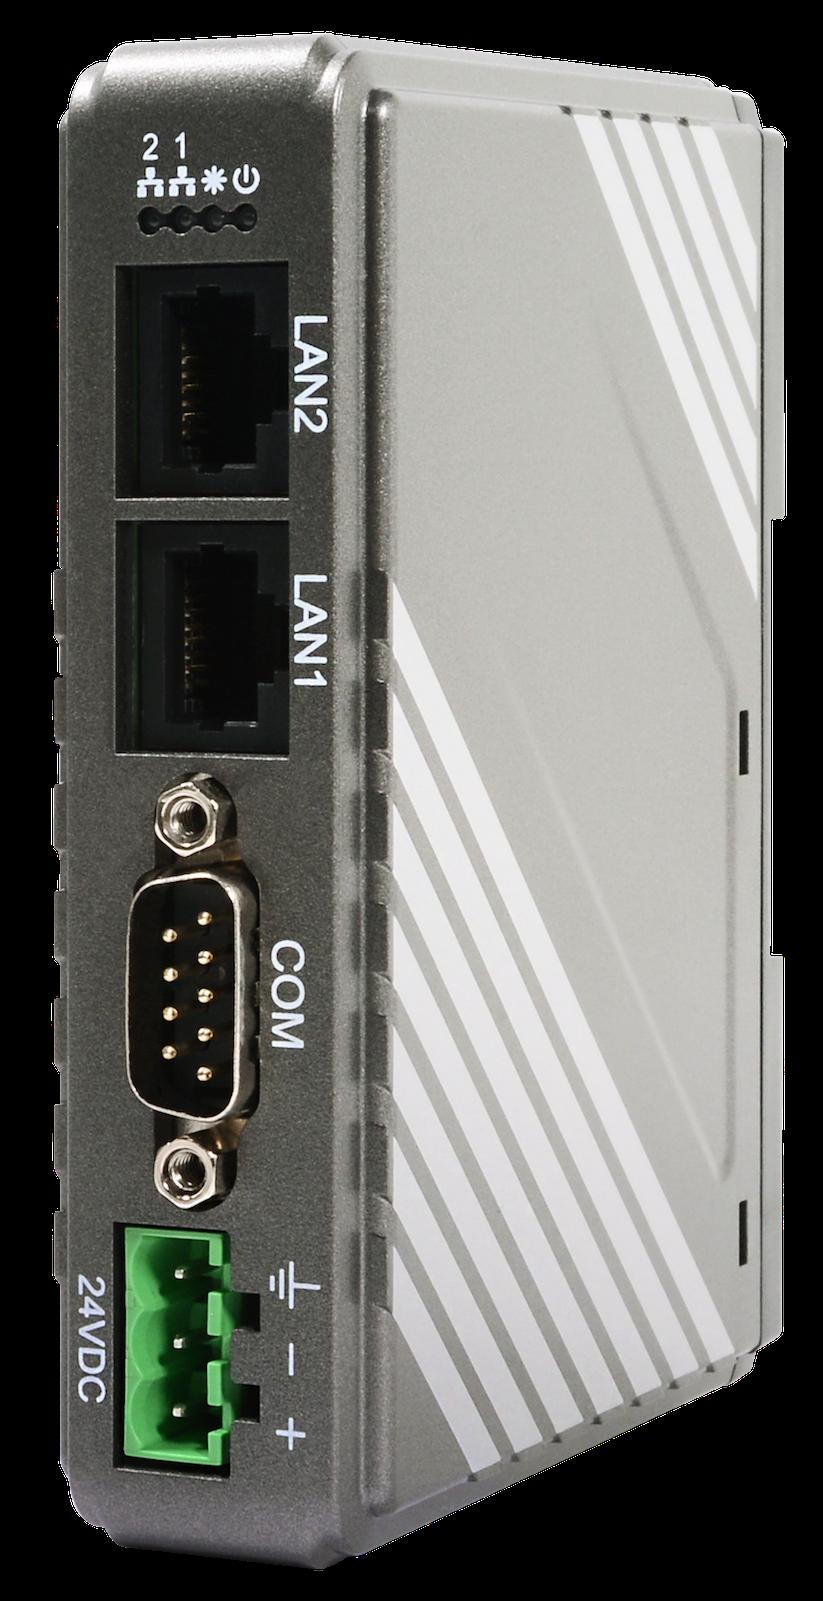 cMT-G01